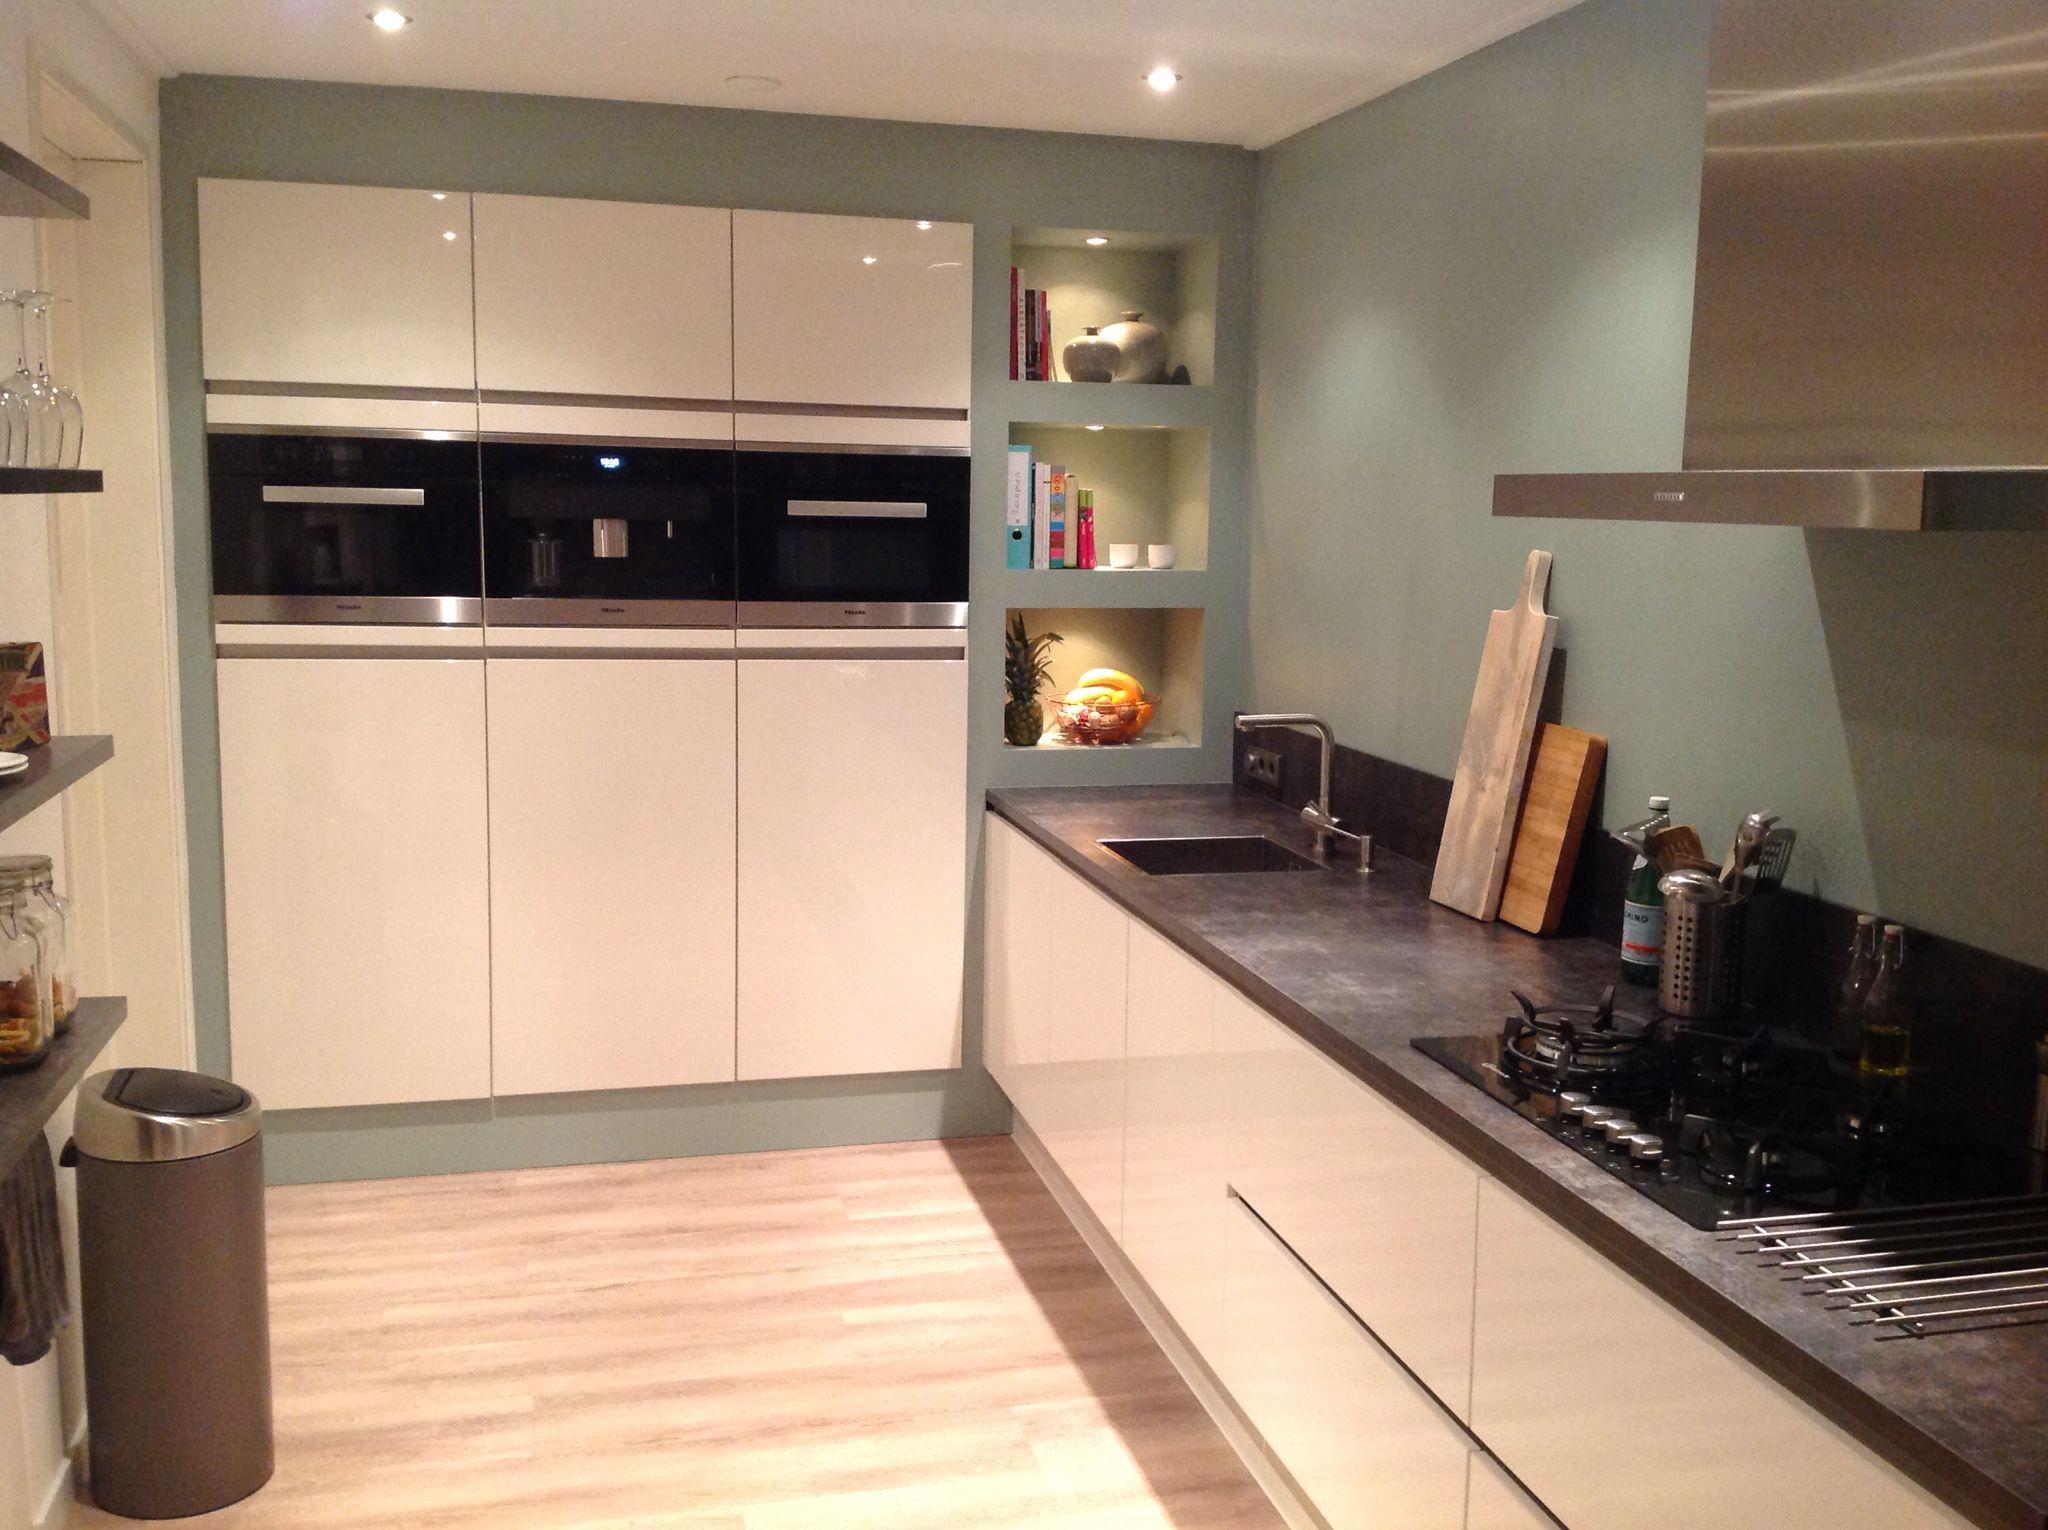 Hoogglans Witte Keuken : Hoogglans witte keuken met miele apparatuur en ingebouwde